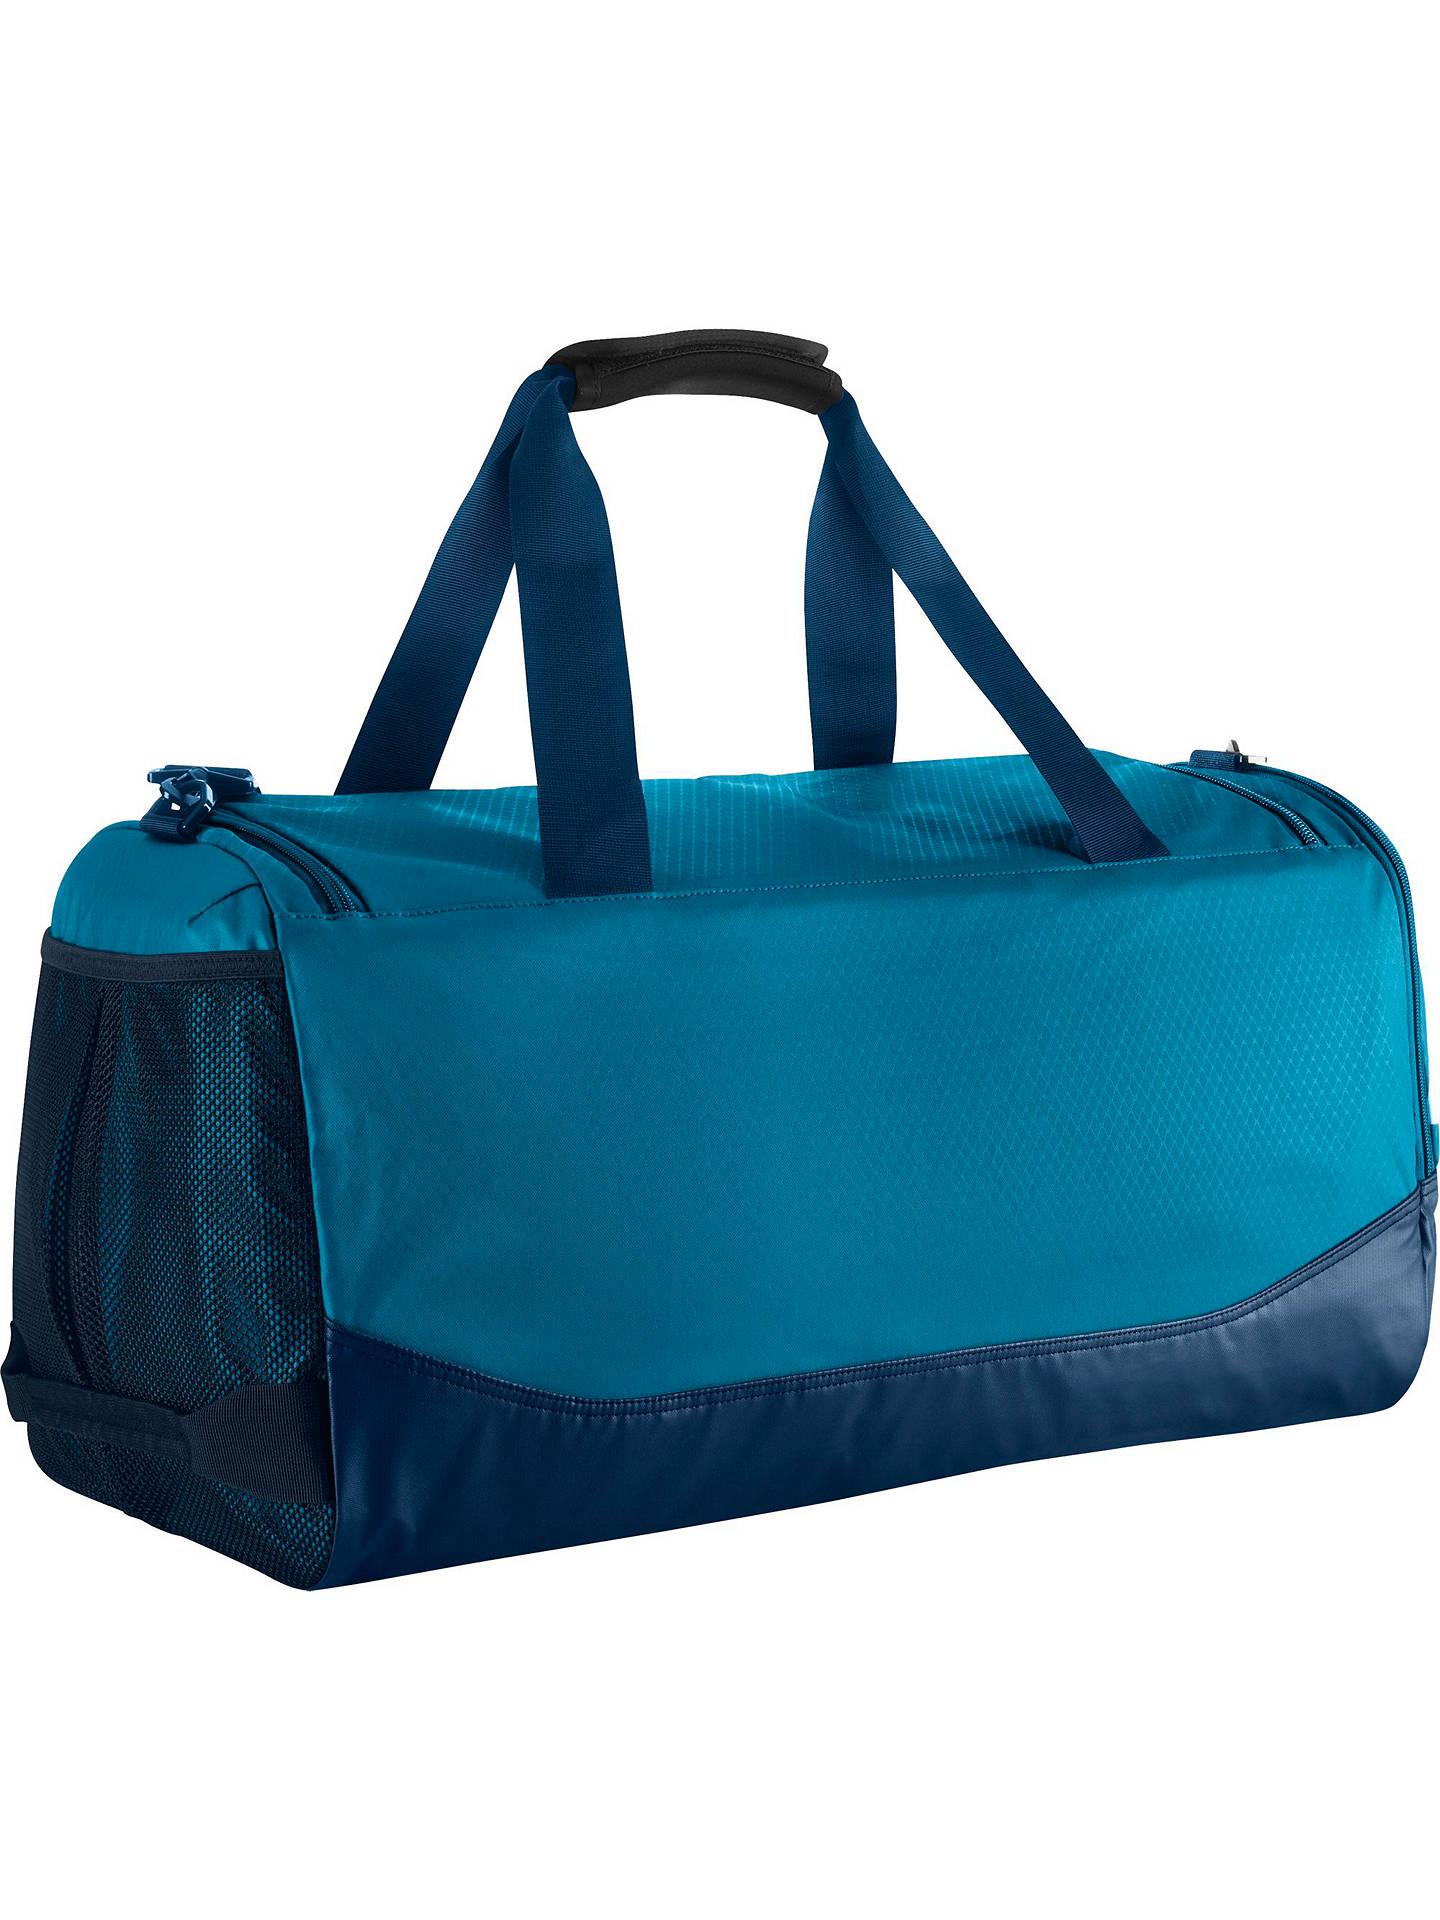 Nike Team Training Max Air Medium Duffel Bag at John Lewis   Partners e9ab06b8969ca